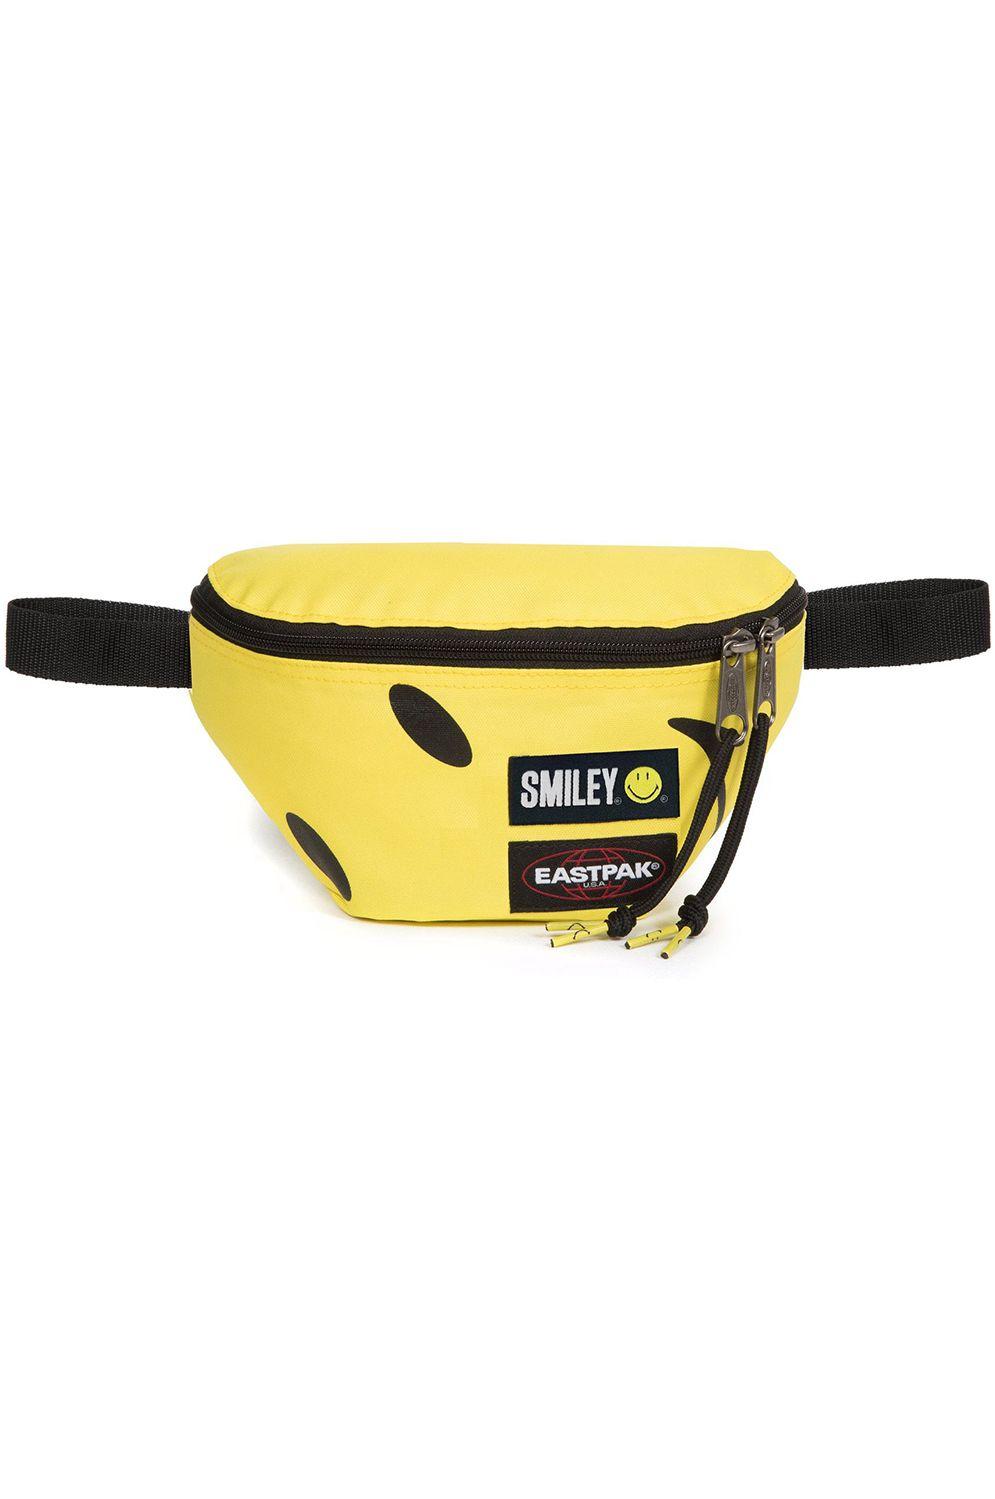 Bolsa Cintura Eastpak SPRINGER Smiley Big